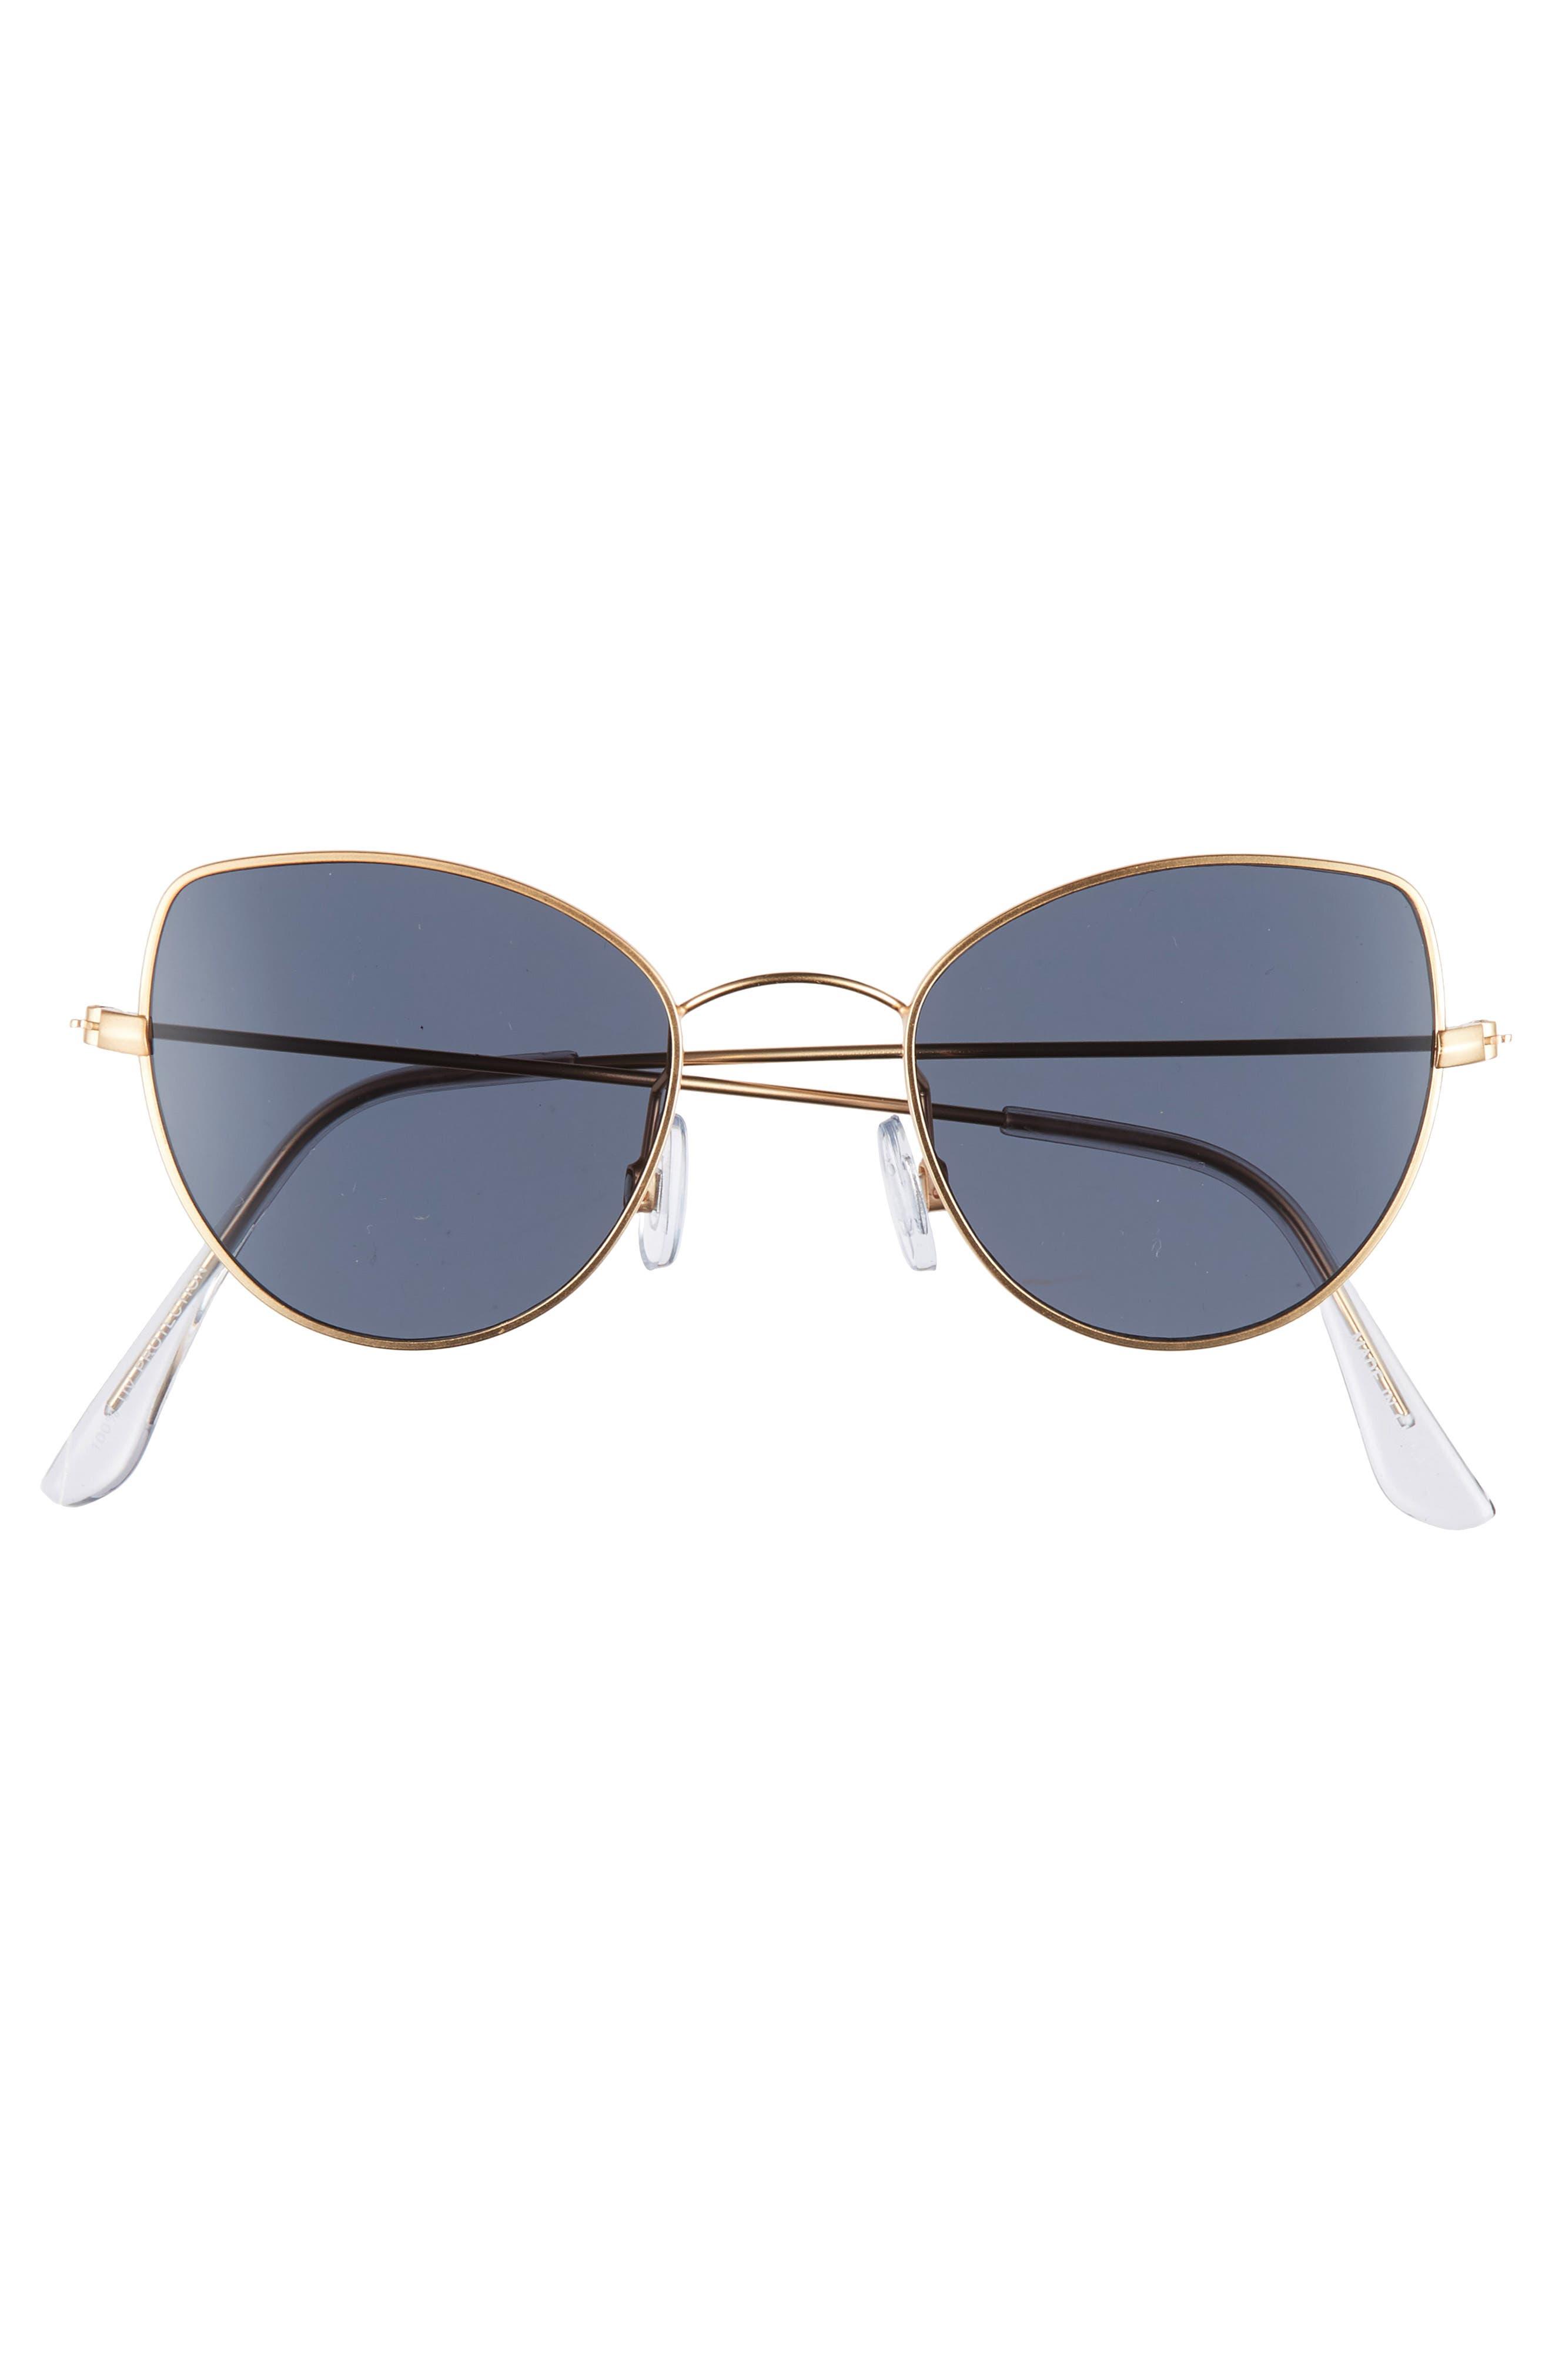 48mm Cat Eye Sunglasses,                             Alternate thumbnail 3, color,                             BLACK/ GOLD